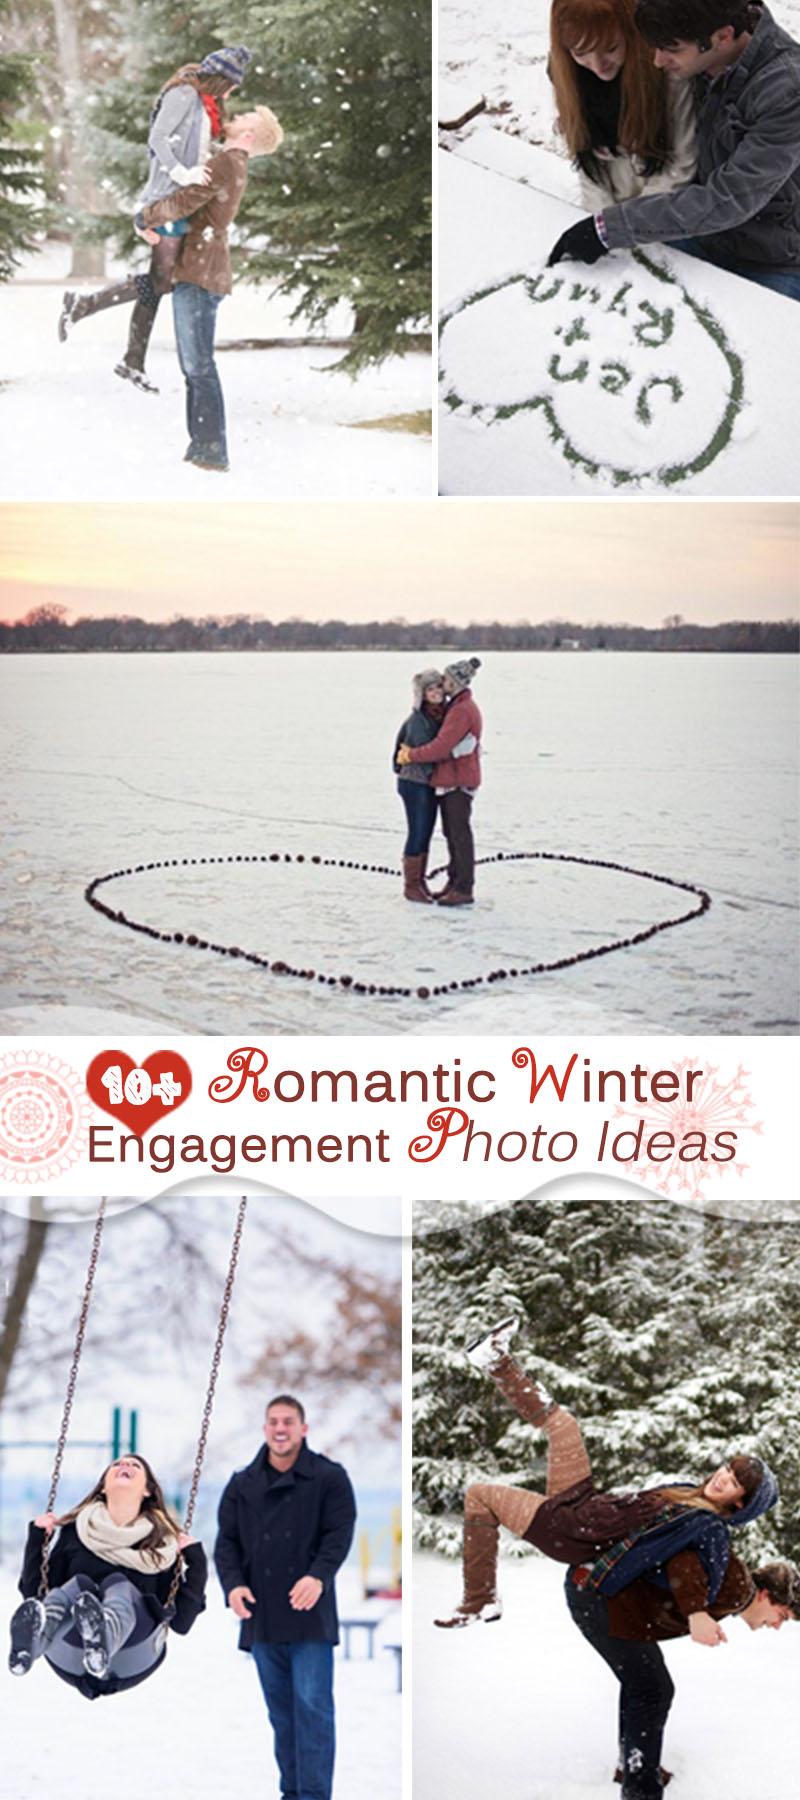 Romantic Winter Engagement Photo Ideas!